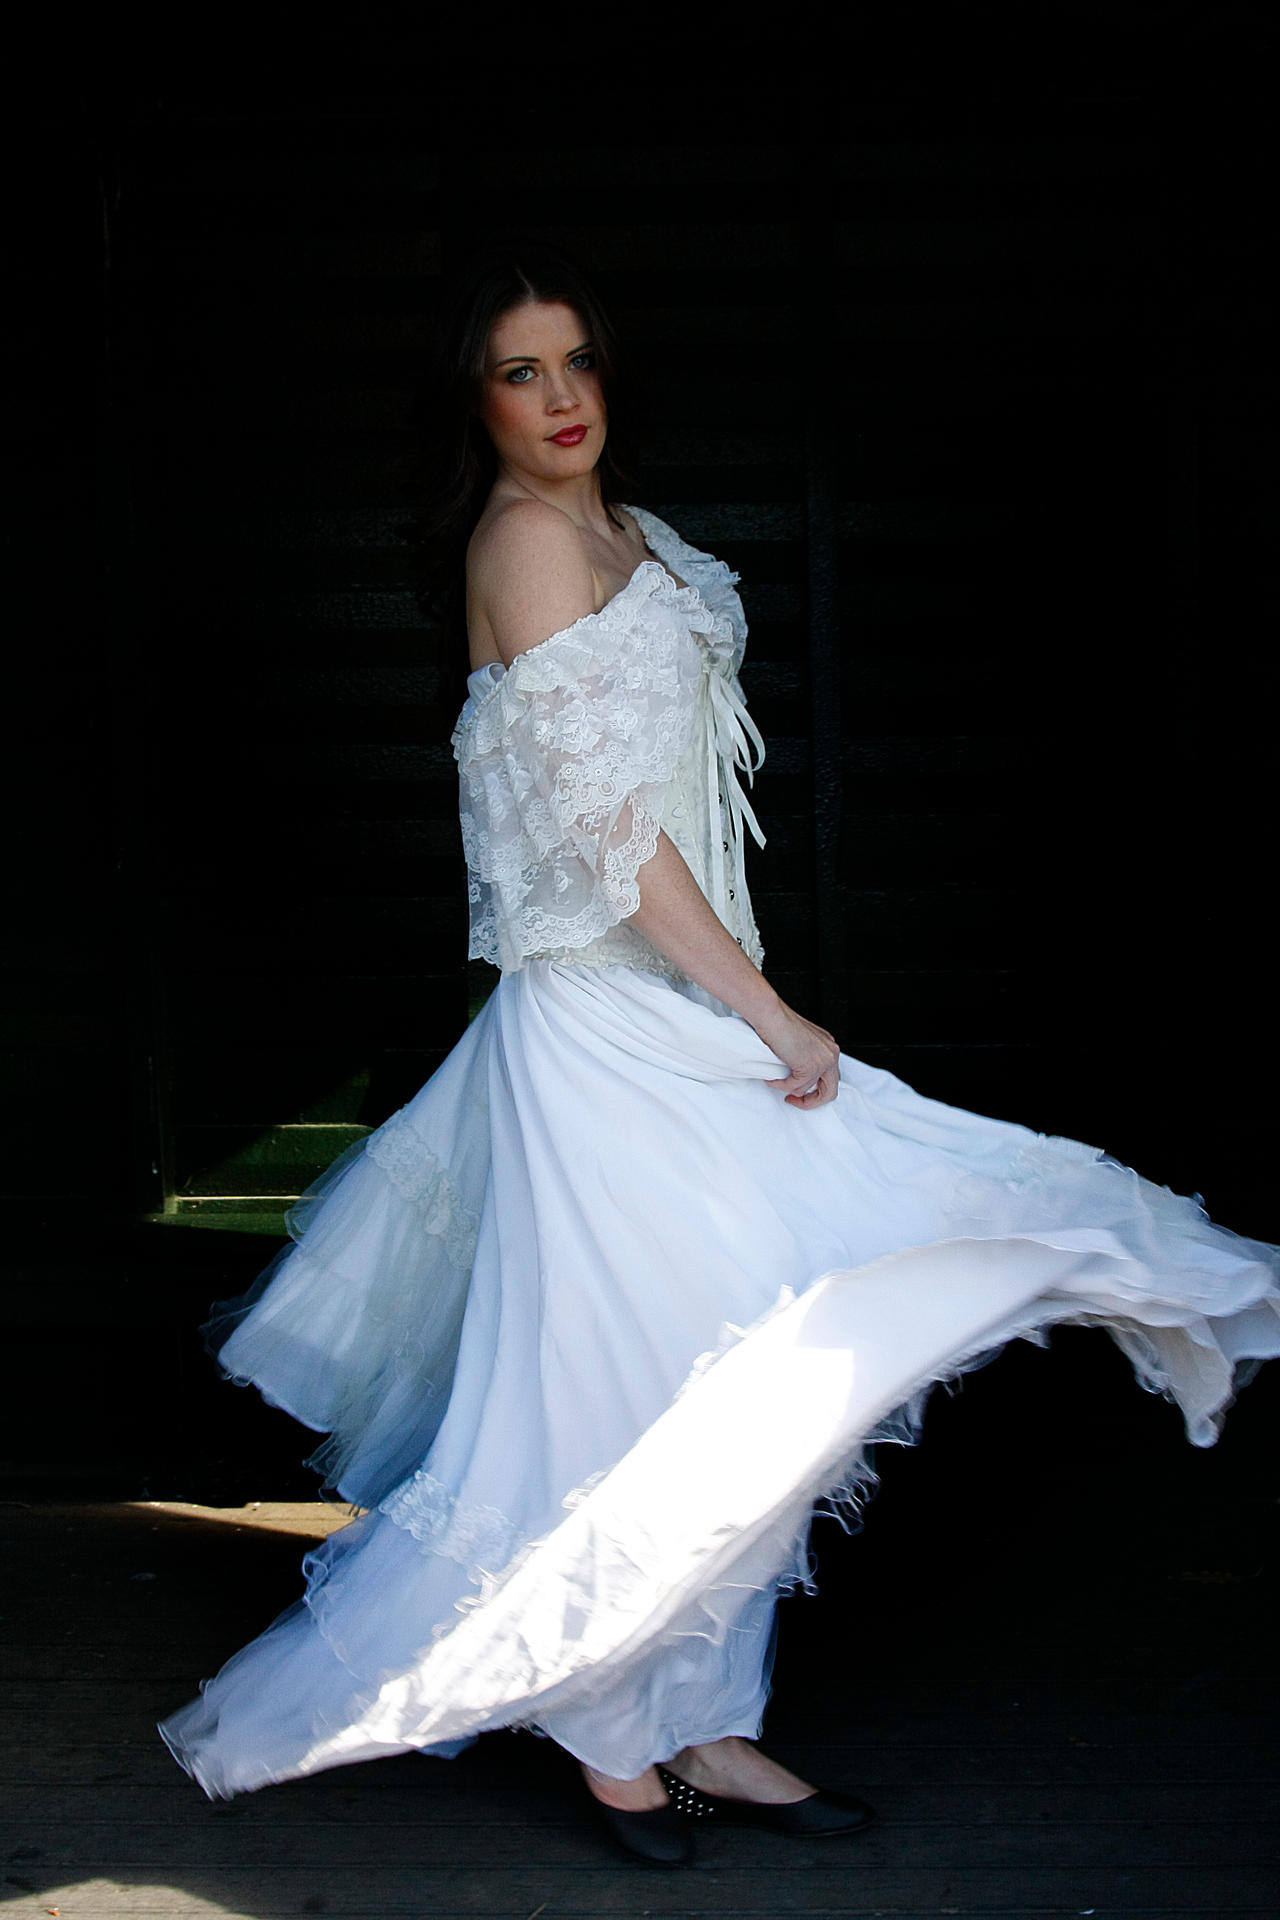 Danielle white dress 22